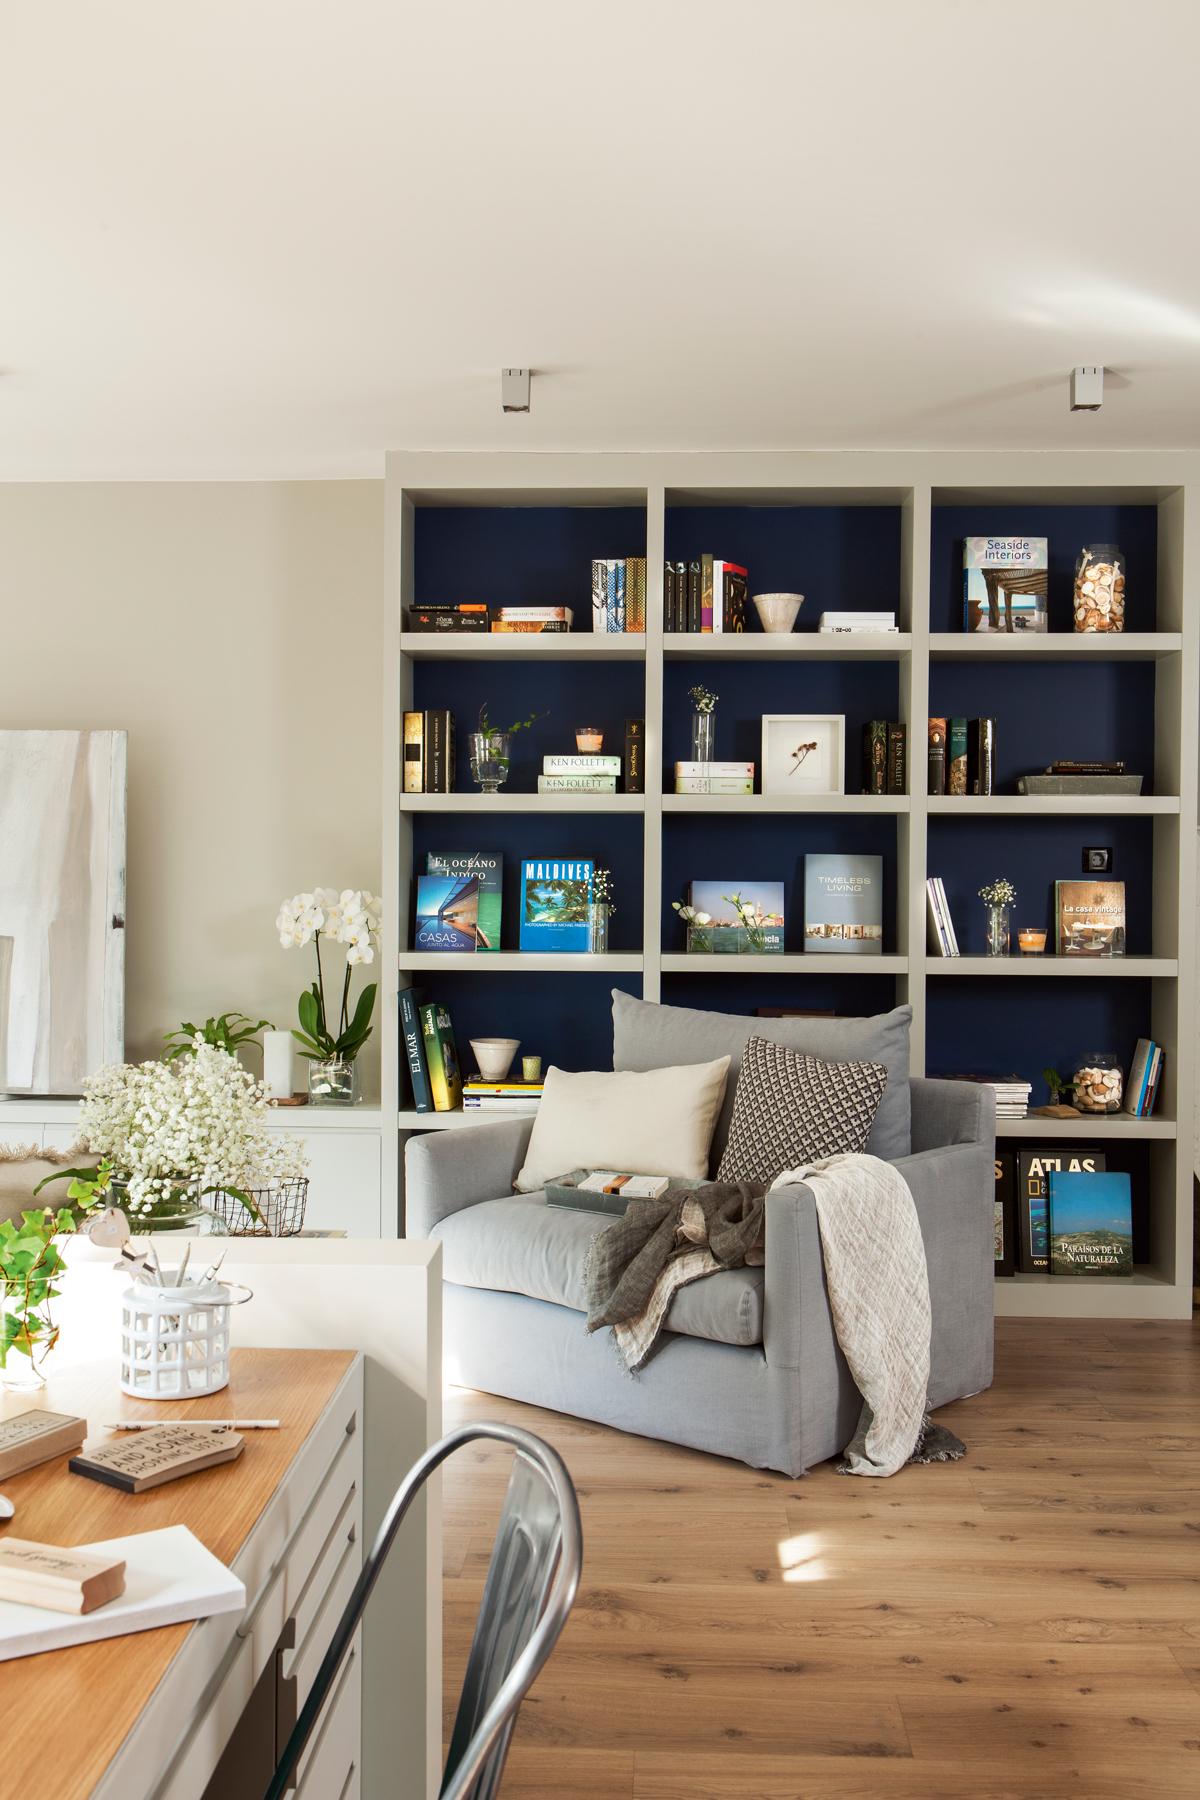 Salones peque os con muebles que aprovechan cada cent metro for Librerias para salones pequenos